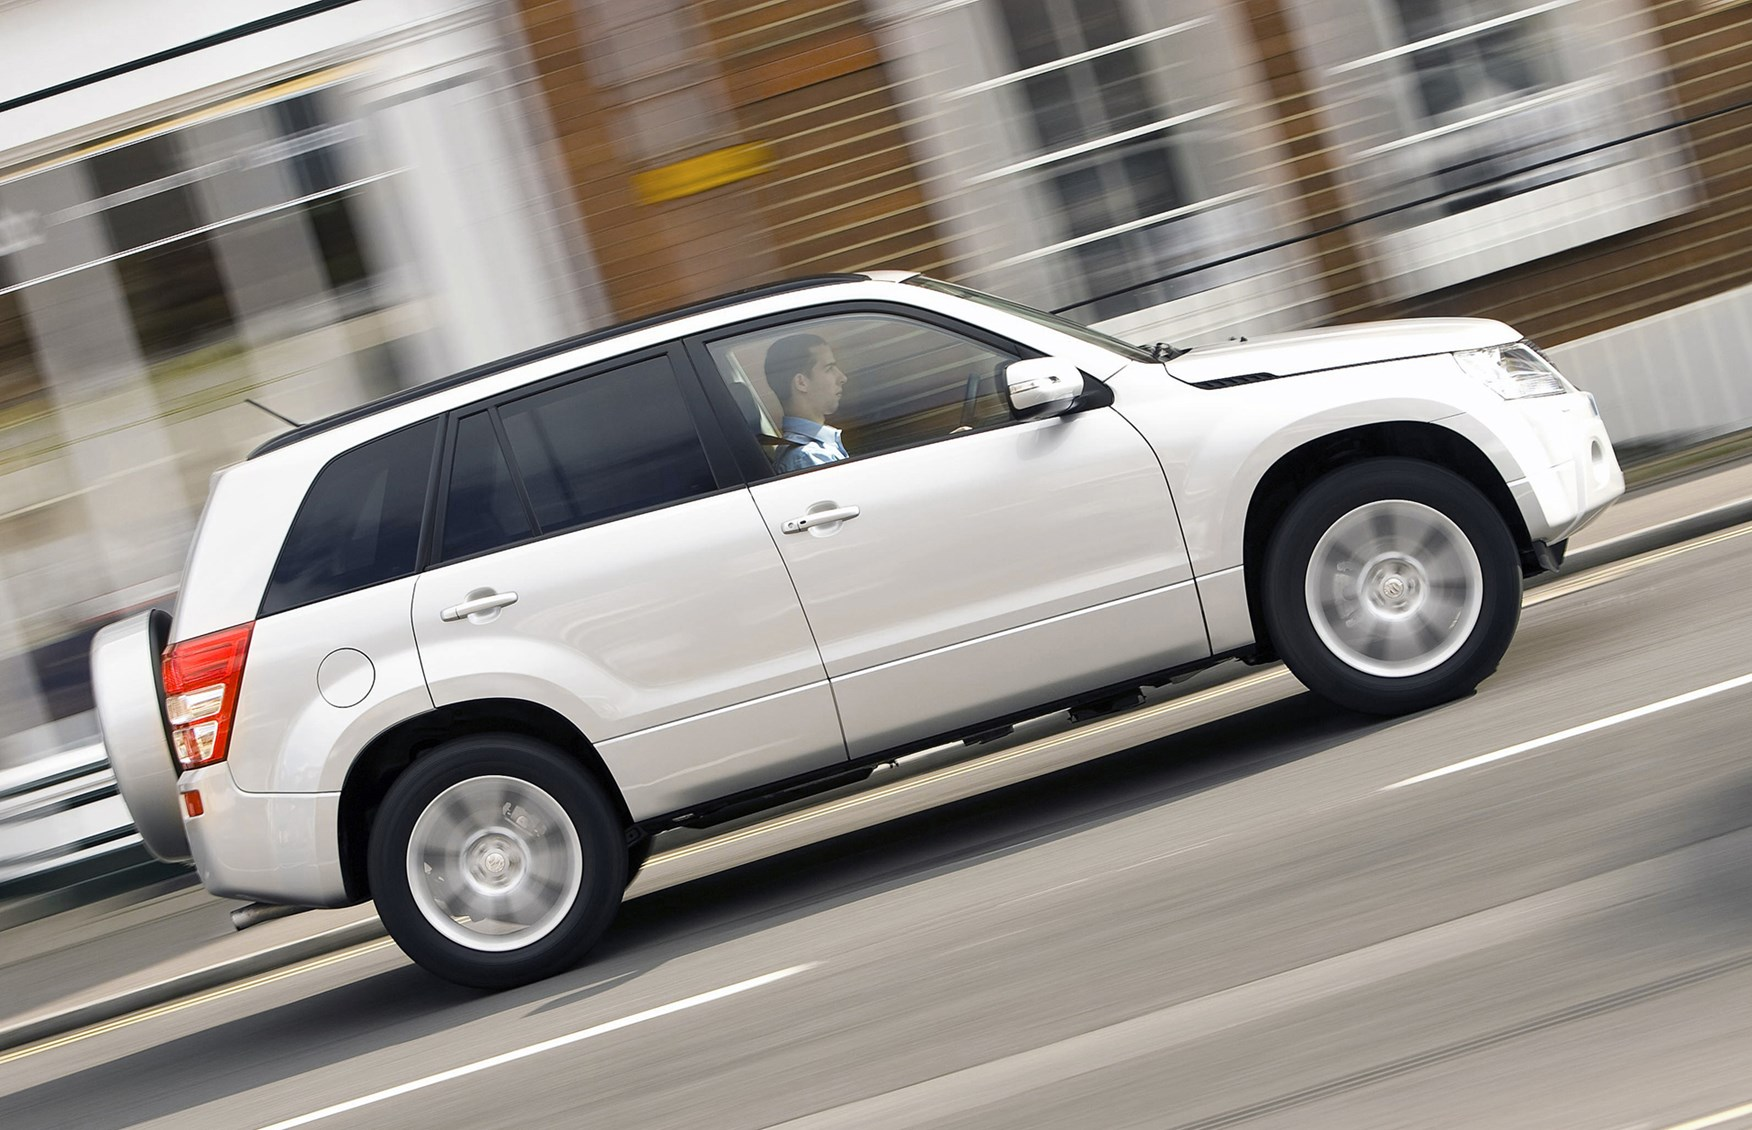 Suzuki grand vitara estate review 2005 2014 parkers handling fandeluxe Gallery